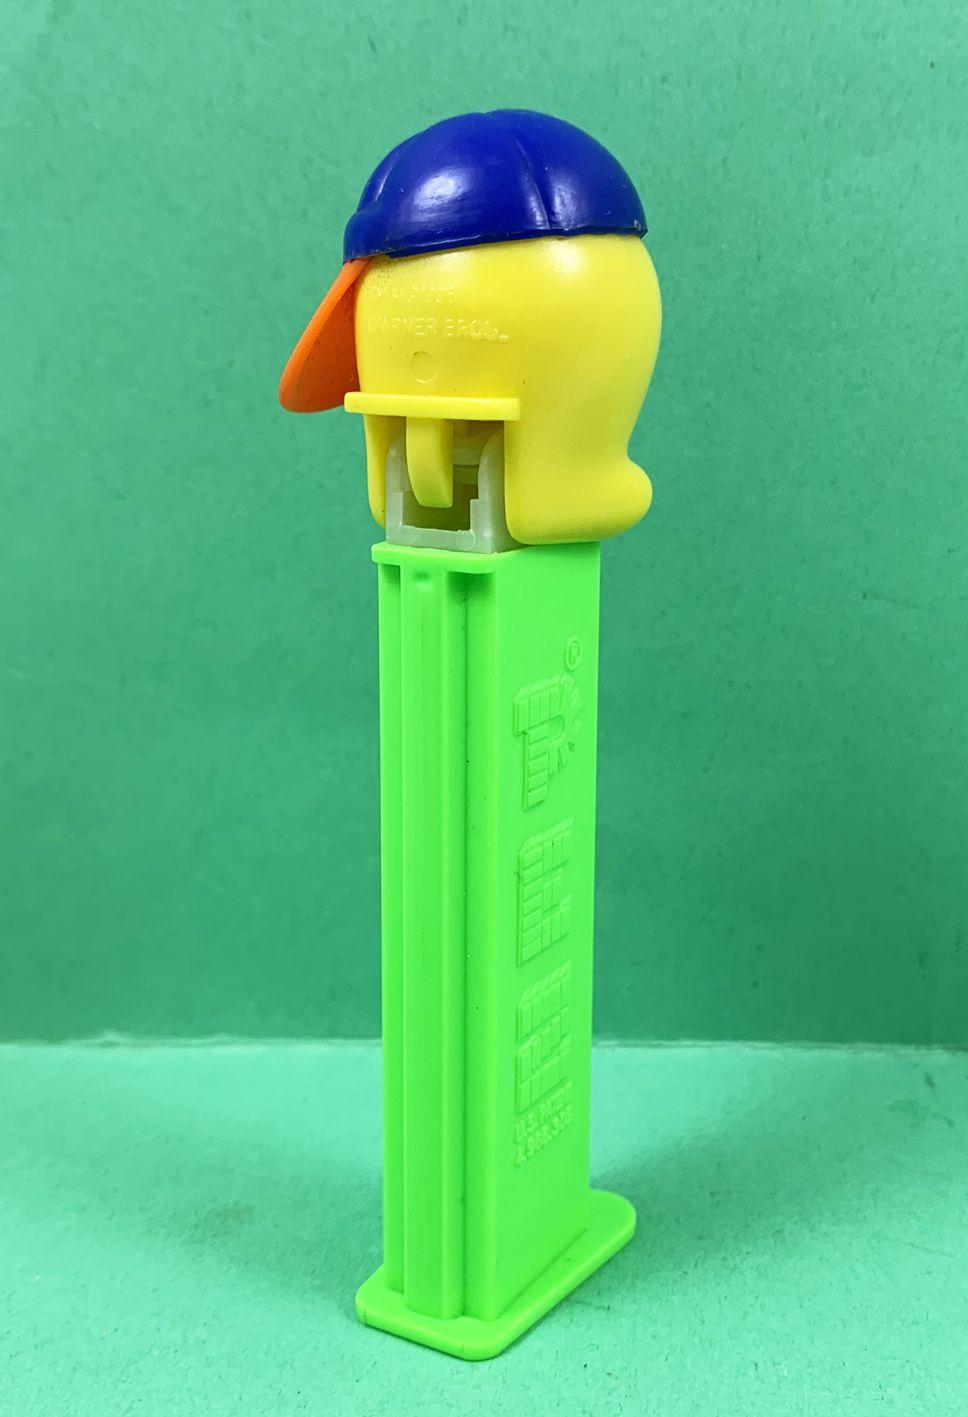 Looney Tunes - Distributeur PEZ - Titi (patent number 4.966.305)